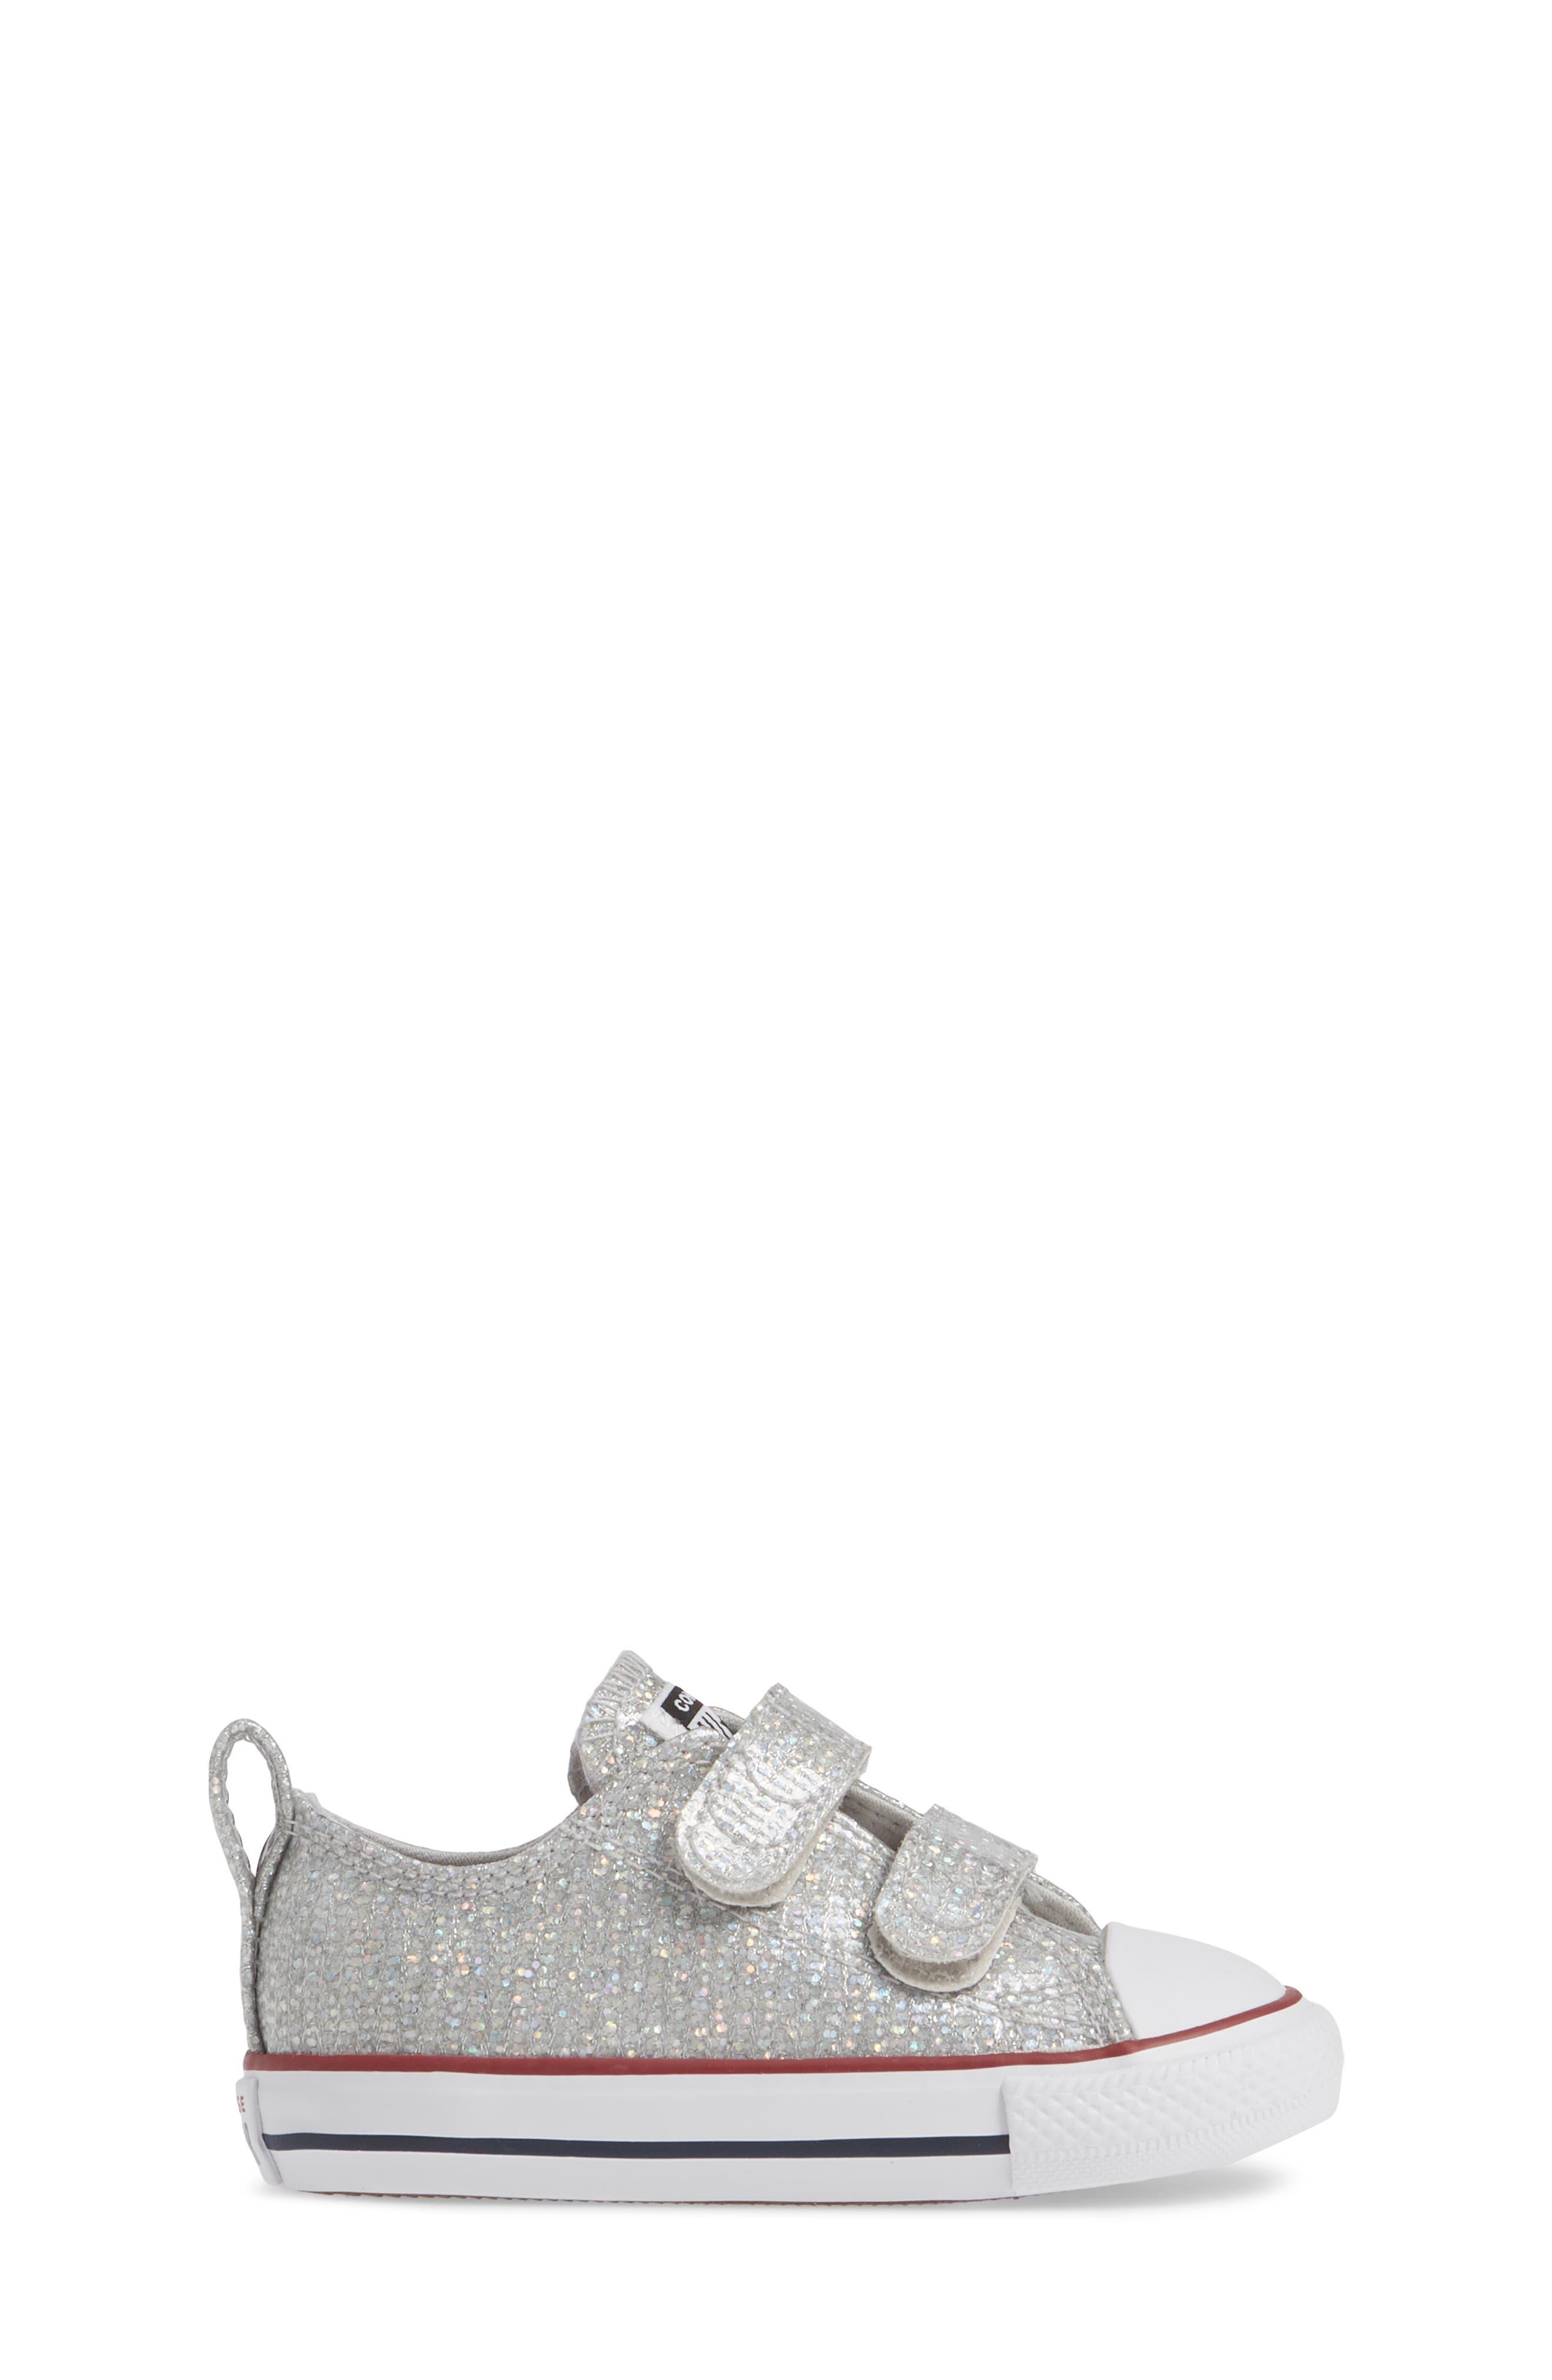 All Star<sup>®</sup> Seasonal Glitter Sneaker,                             Alternate thumbnail 3, color,                             050